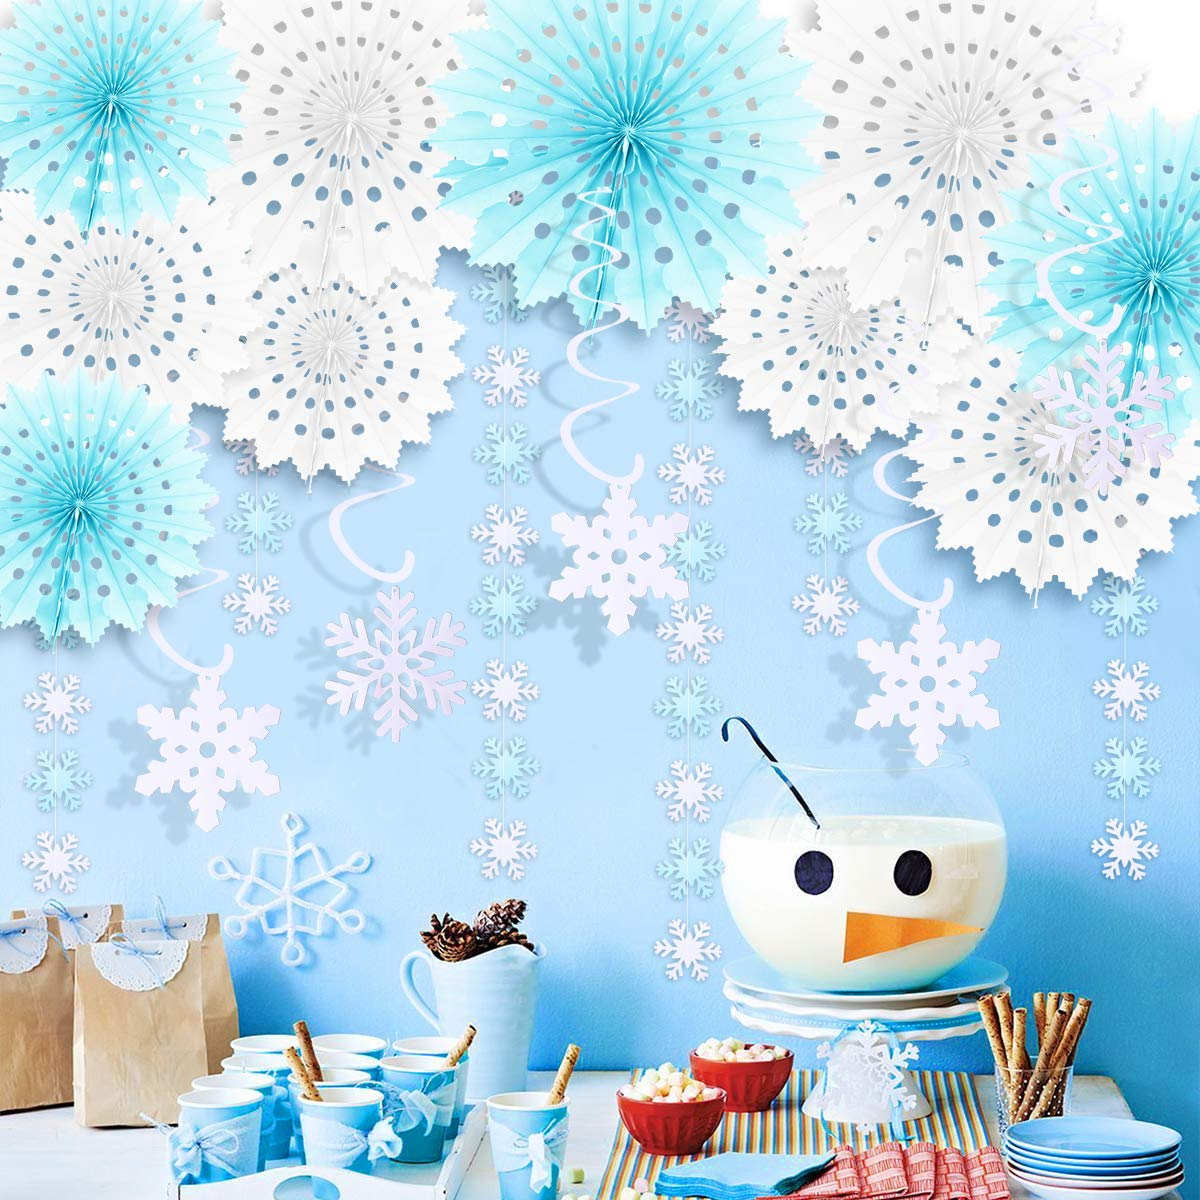 JOYMEMO Winter Snowflake Decorations Winter Wonderland Snowflake Paper Fans Christmas Hanging Swirls for Holiday, Snow Princess Theme Birthday Party Supplies